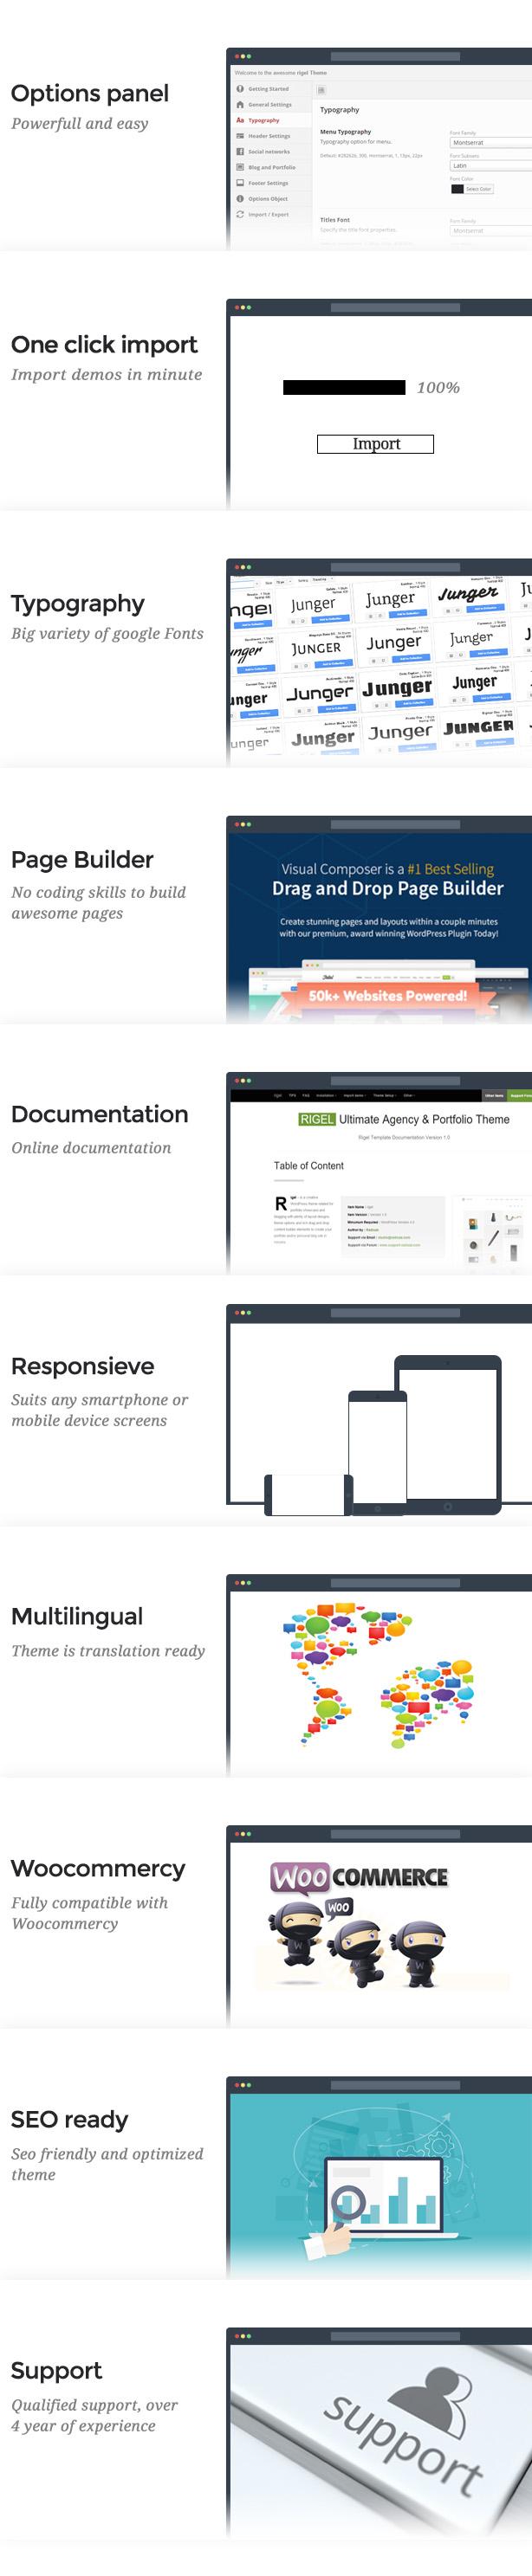 Rigel - Ultimate Agency & Portfolio Theme - 6